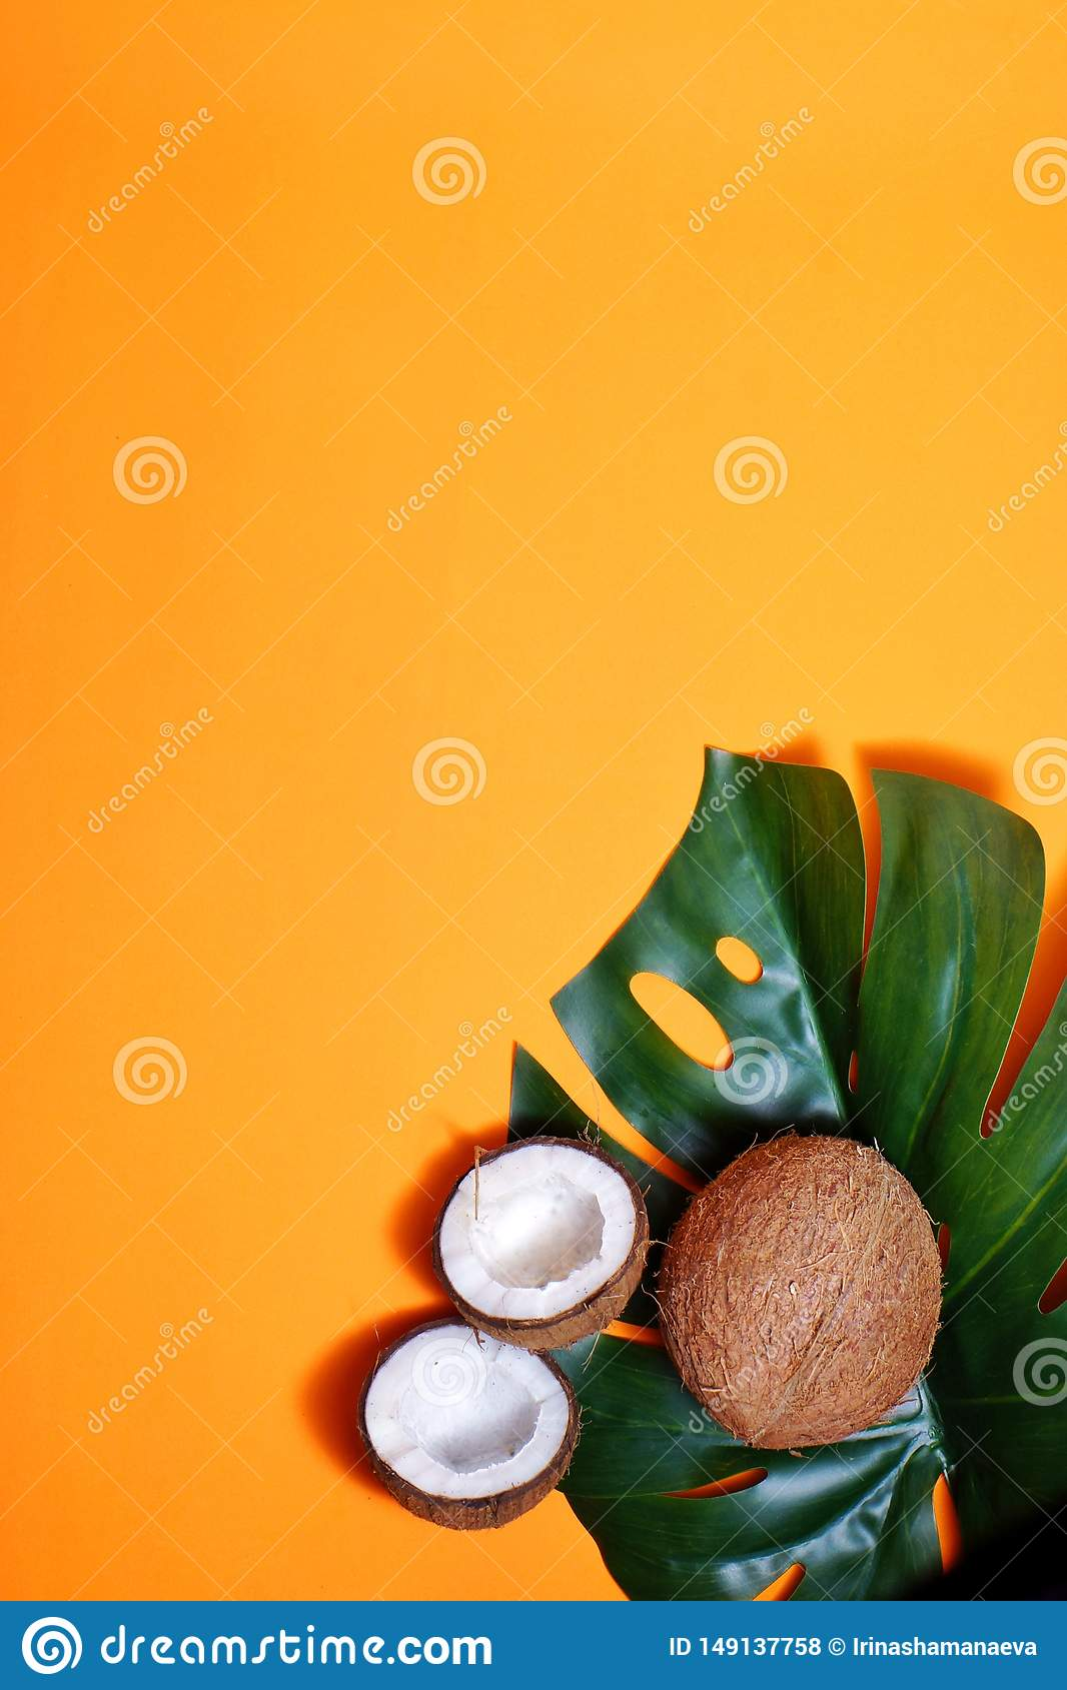 Kokosn?tter och tropiskt blad av monsterav?xten med p? orange bakgrund Plant lager, b?sta sikt, kopieringsutrymme laga mat som ?r